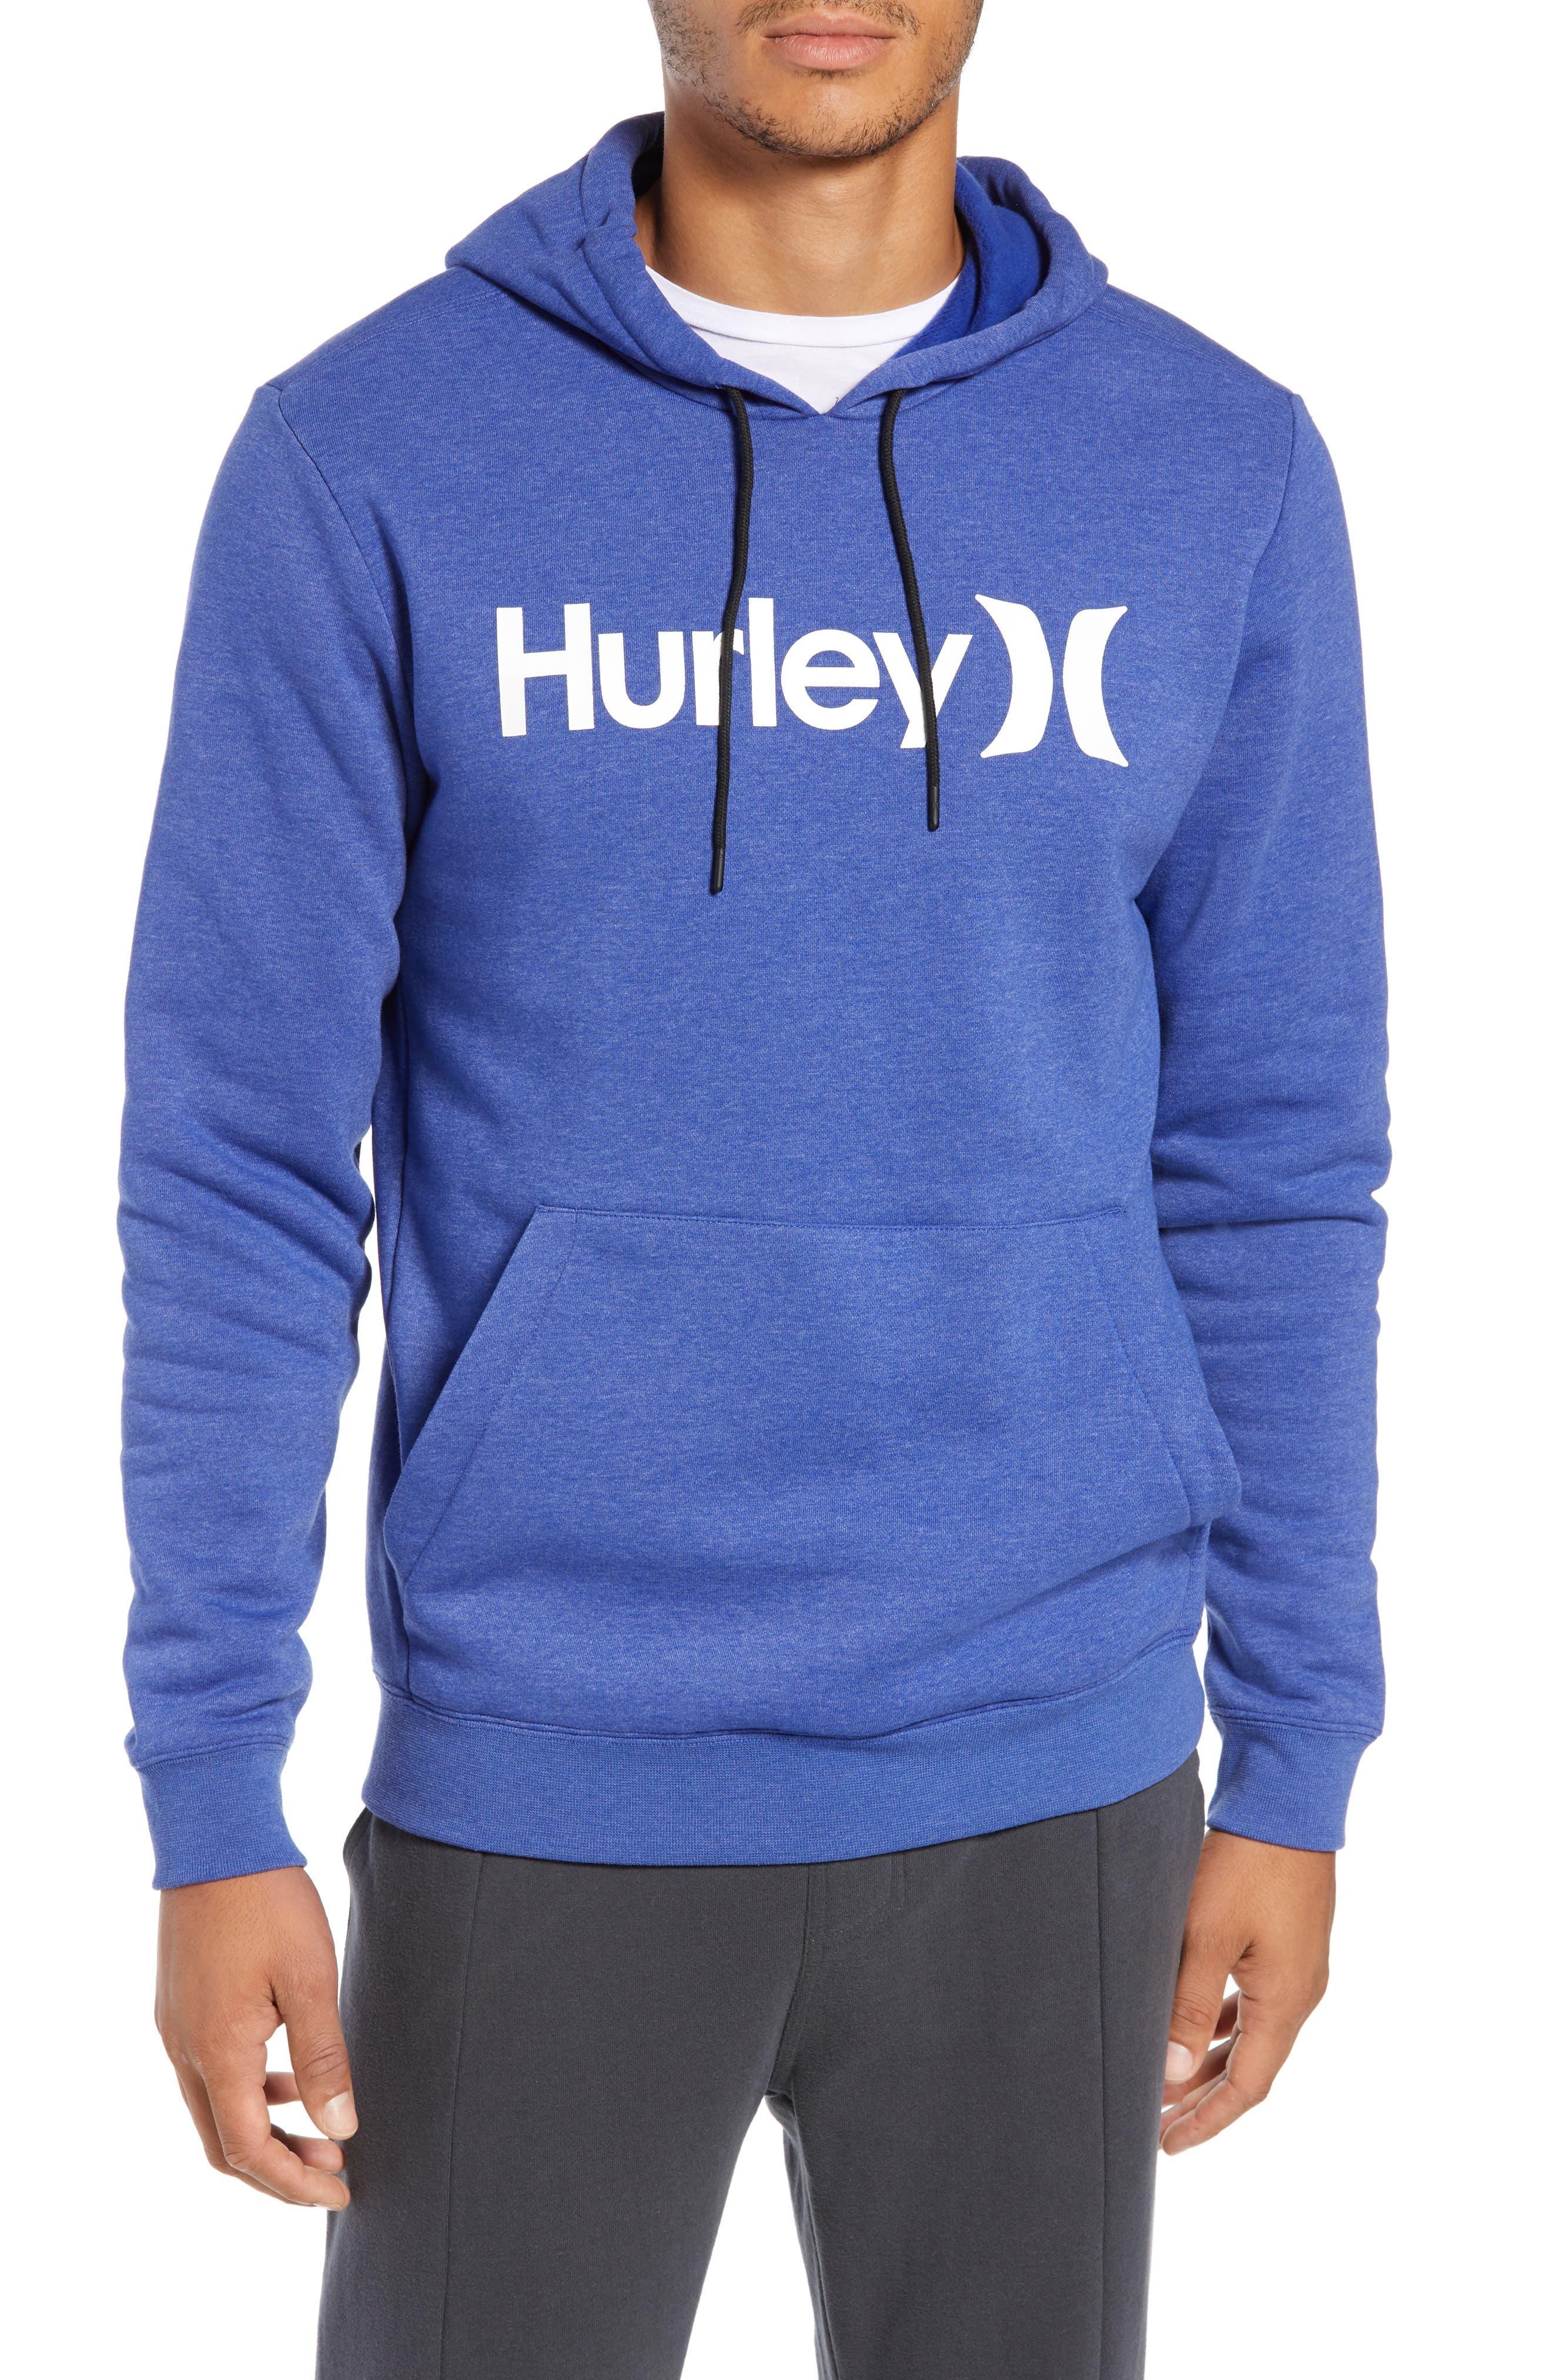 Surf Check Hoodie Sweatshirt, Main, color, DEEP ROYAL HEATHER/ WHITE